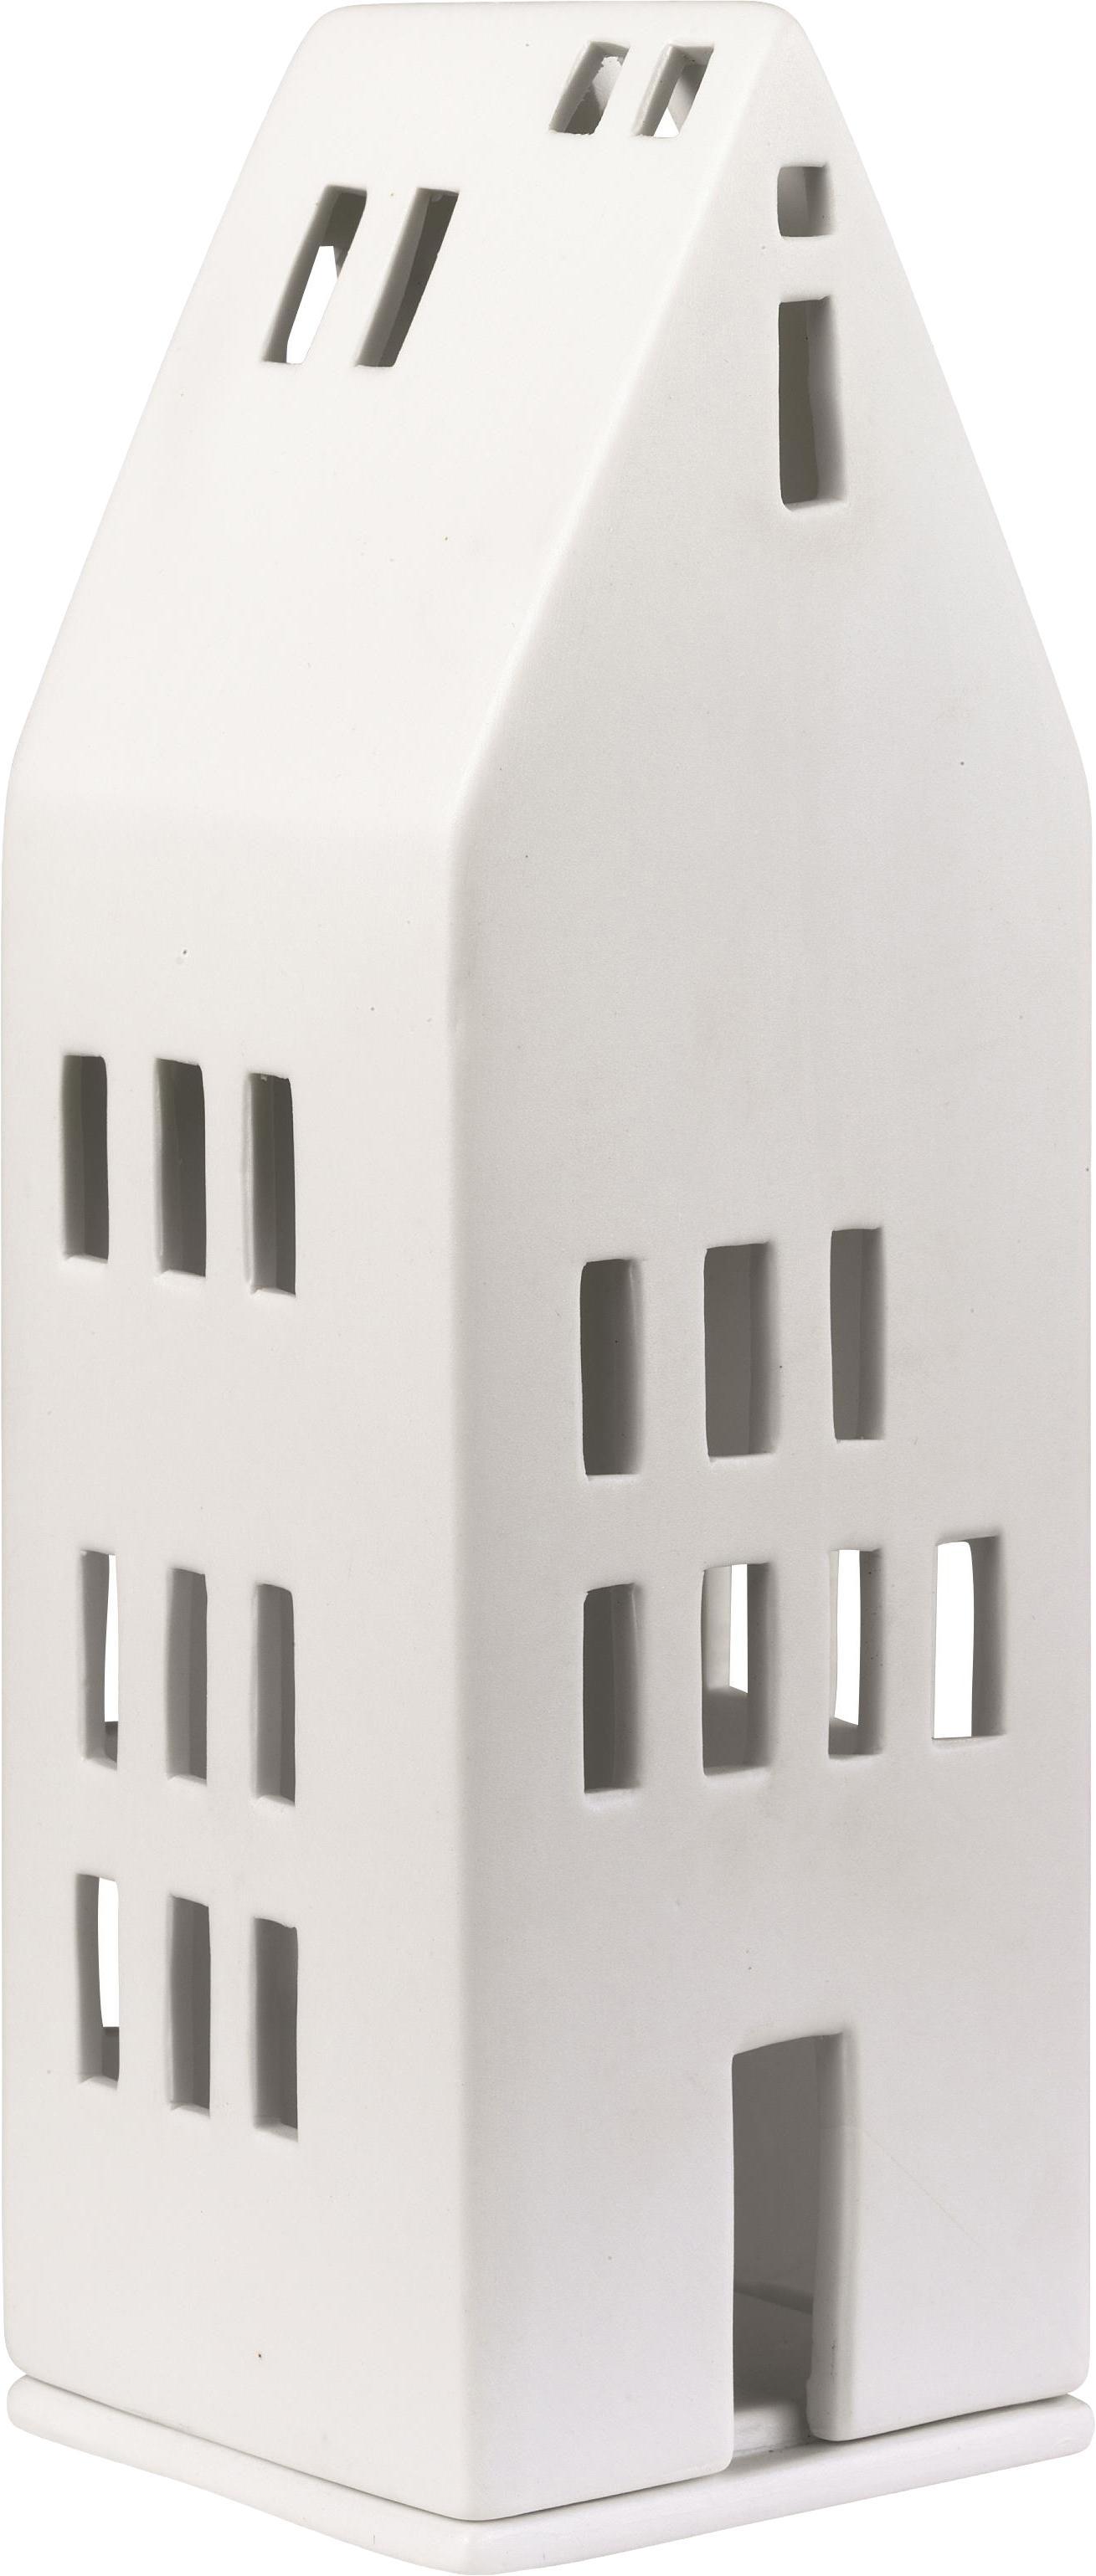 Portacandela Building, Porcellana, Bianco, Larg. 8 x Alt. 22 cm